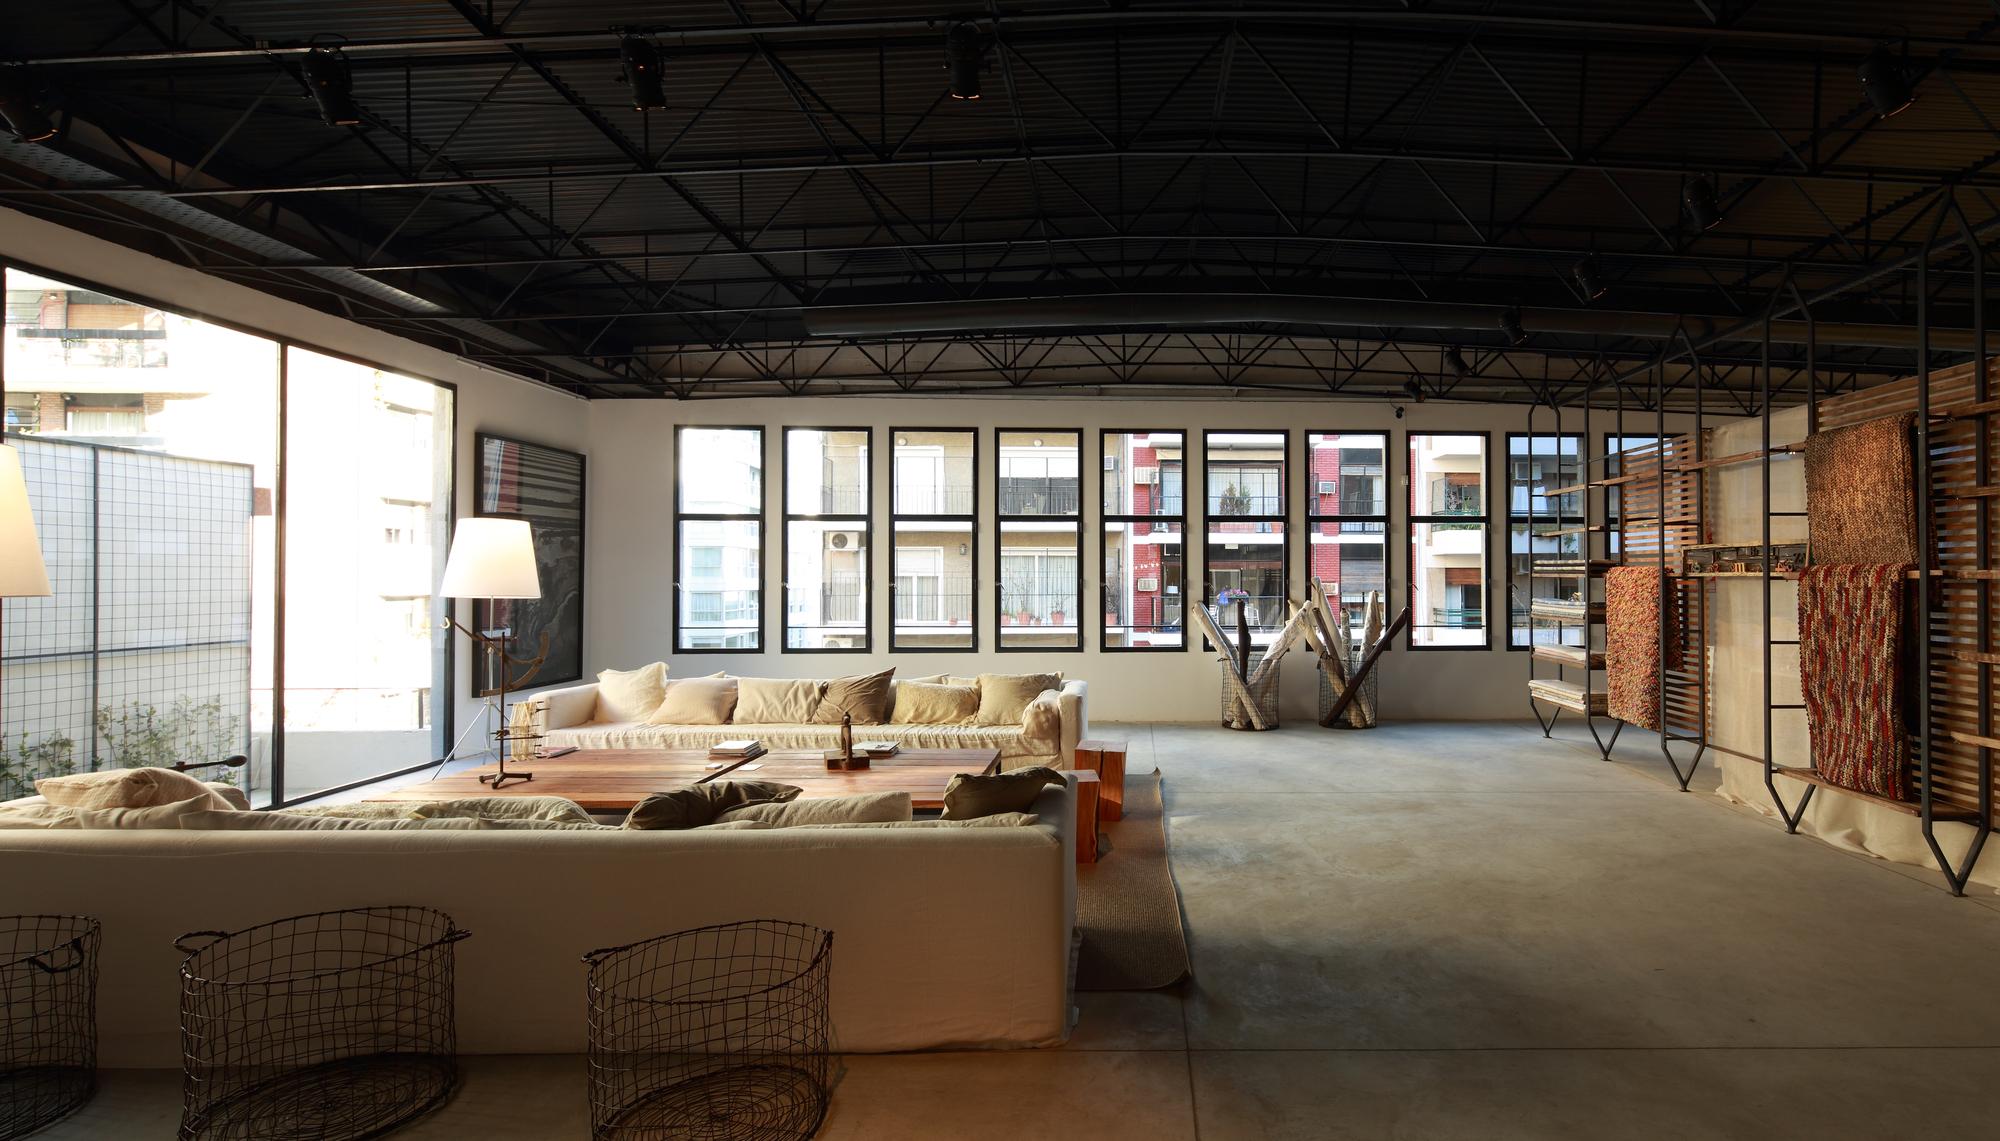 521cbd70e8e44eeb1b000066_textiles-del-sur-offices-ana-smud_living.jpg